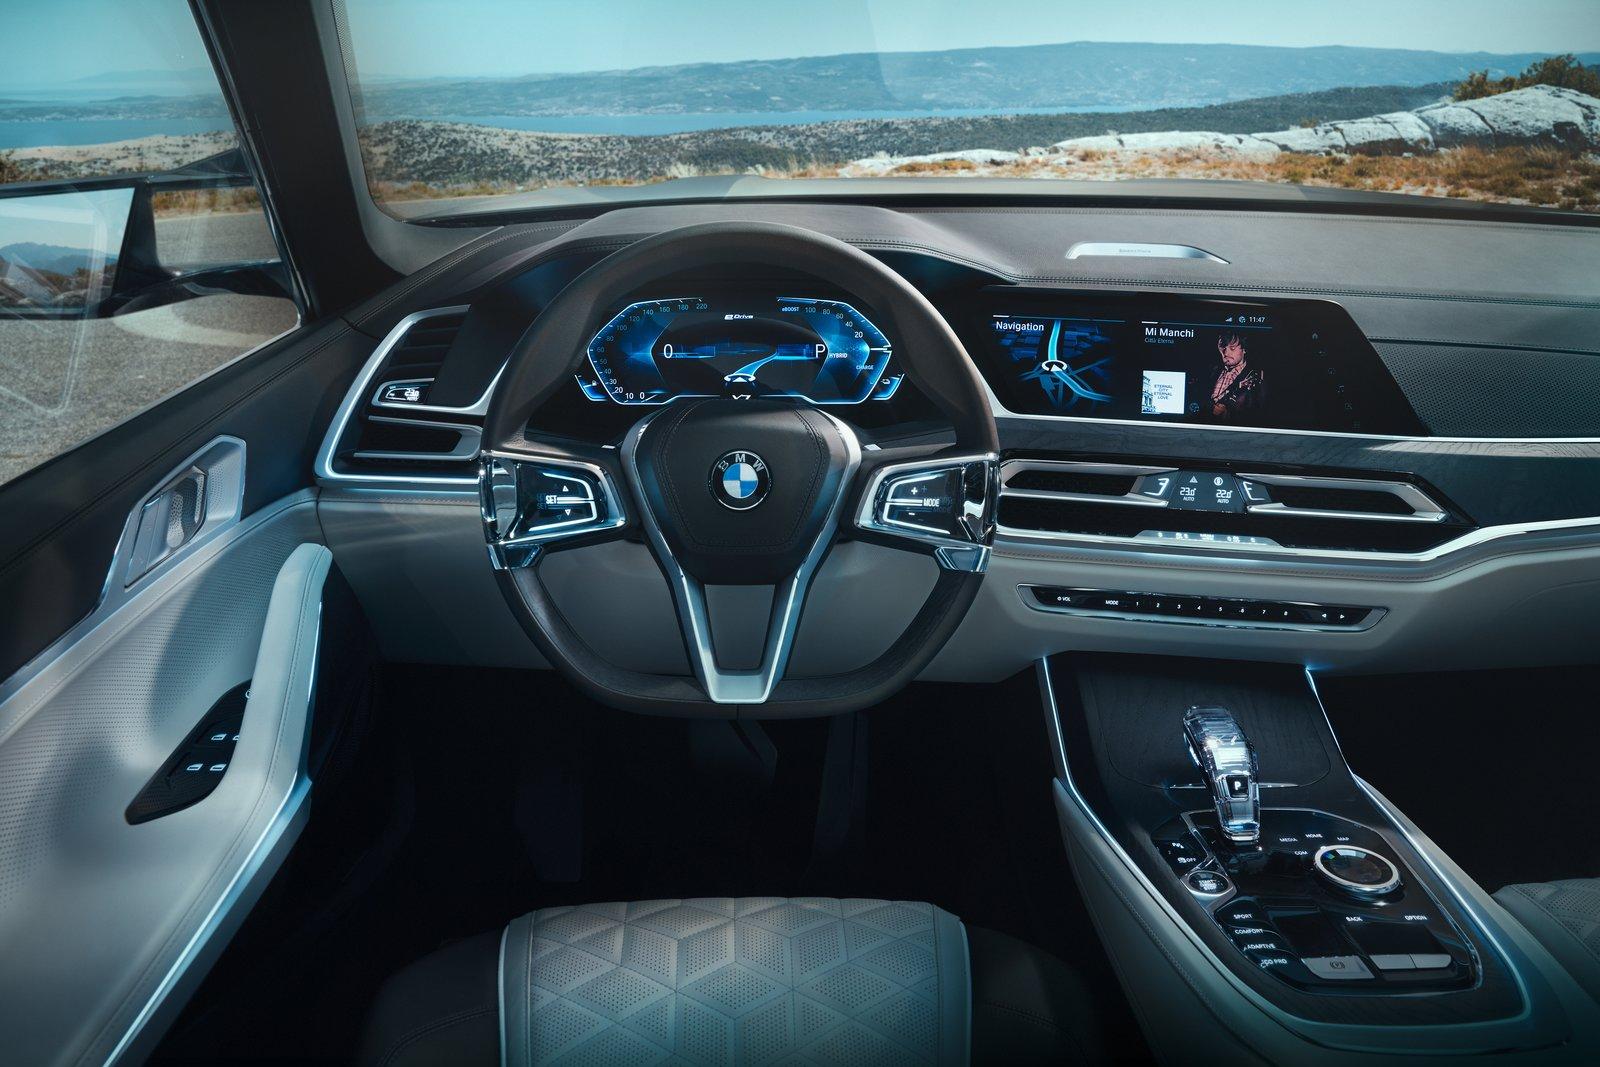 2019 BMW X7 Cockpit